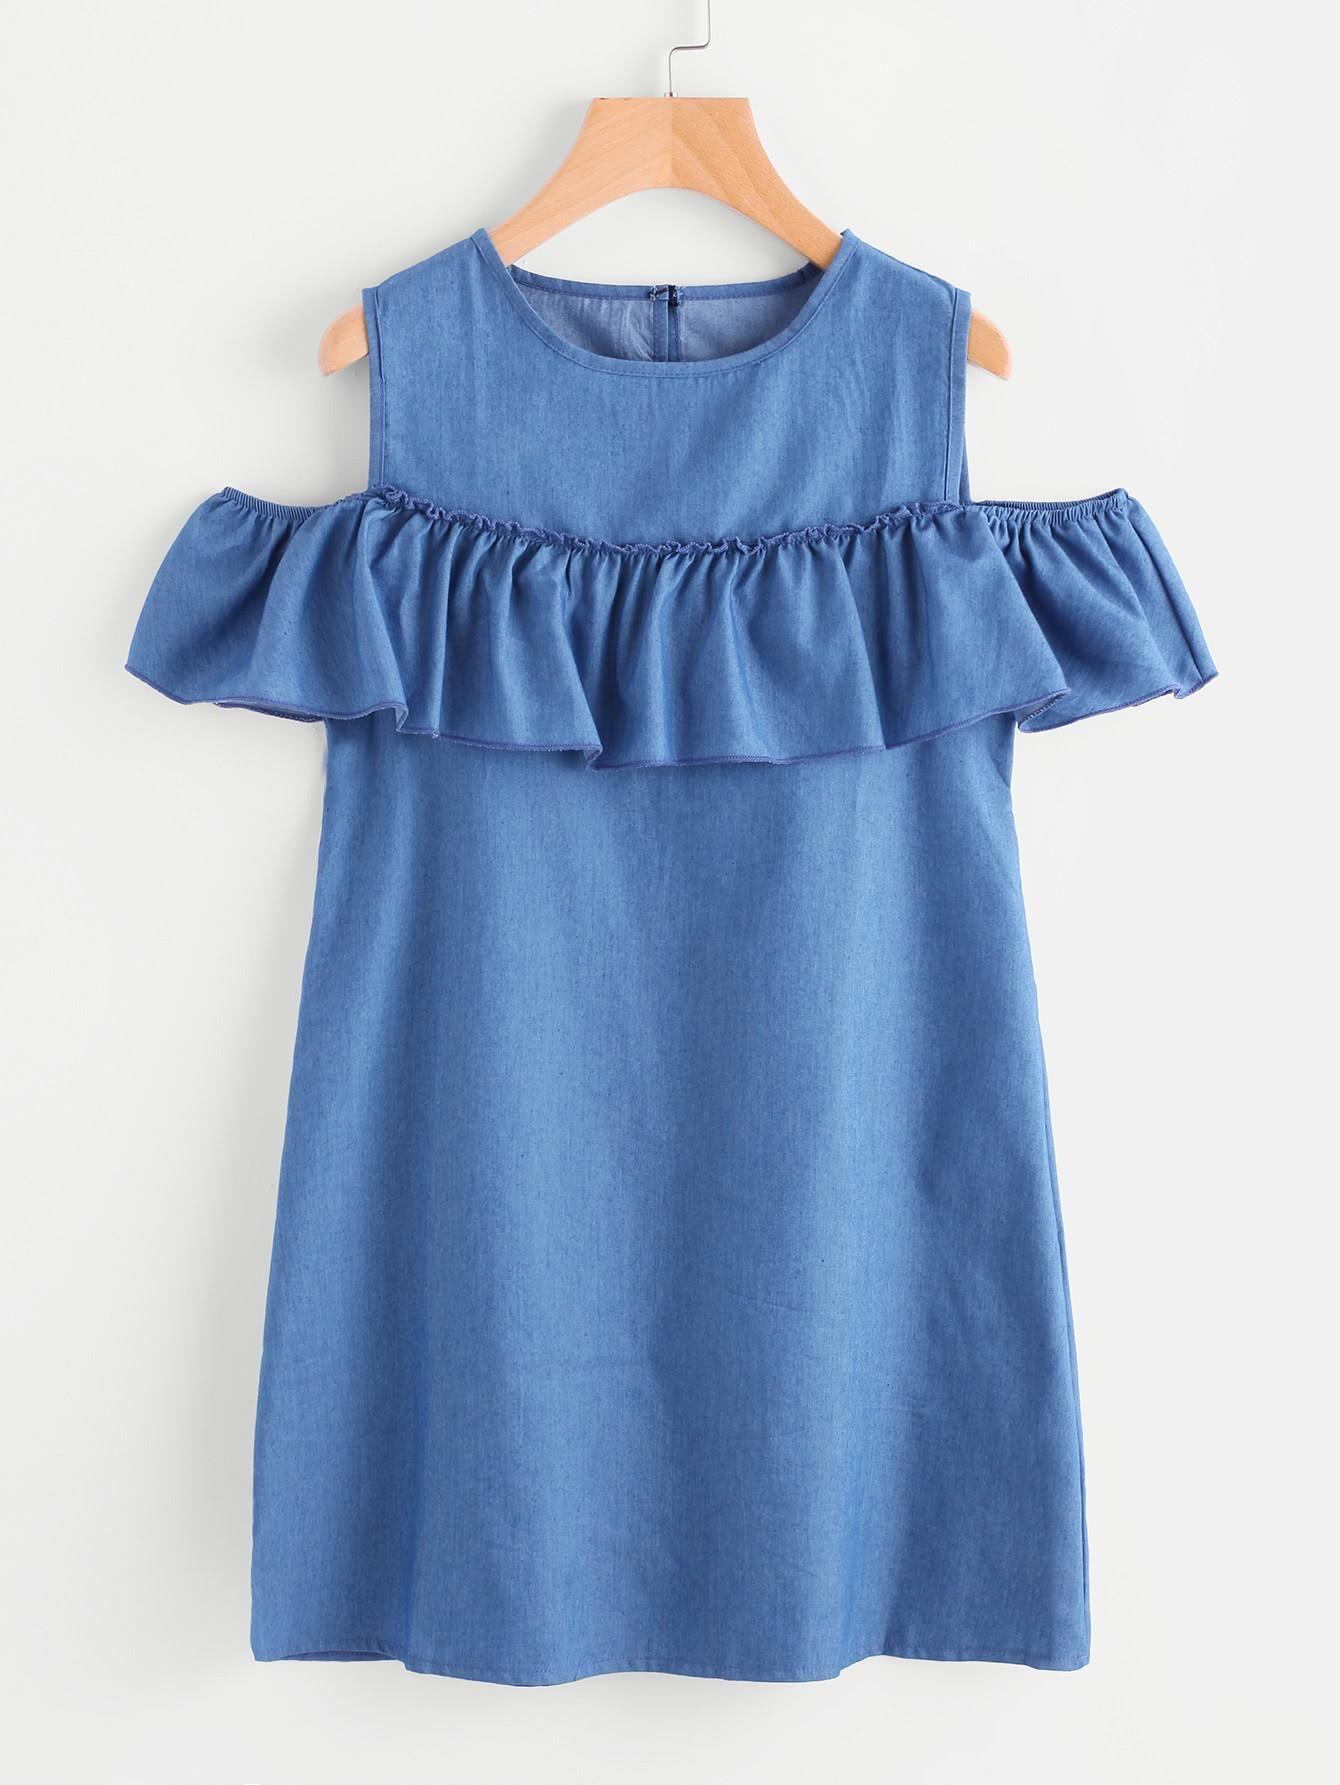 737ac4ee22  mothersday  AdoreWe  SheIn -  SheIn Open Shoulder Frill Trim Chambray Dress  - AdoreWe.com